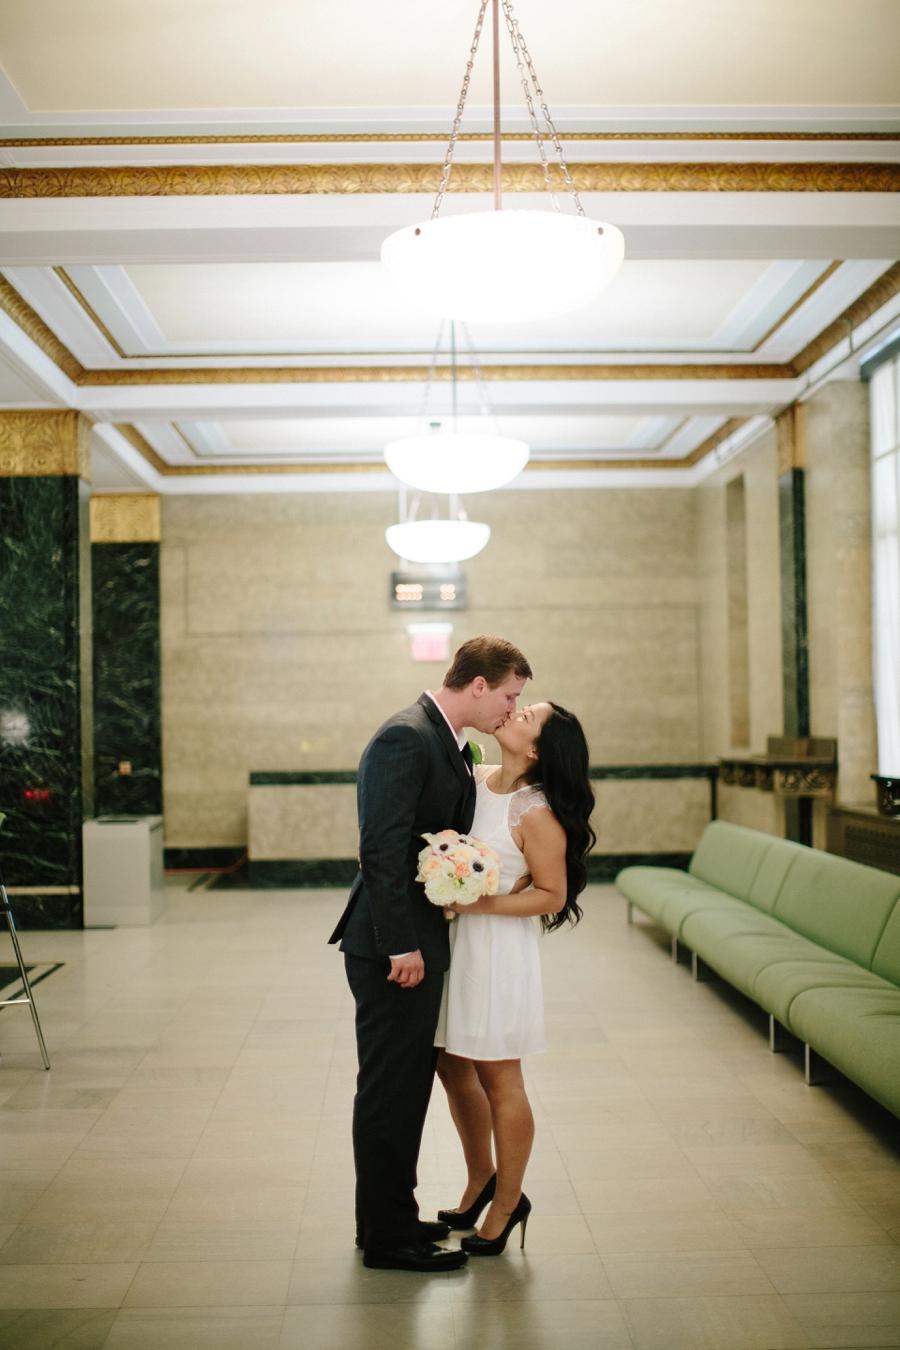 elopement-wedding-photographer-ny-nj-destination_0017.jpg